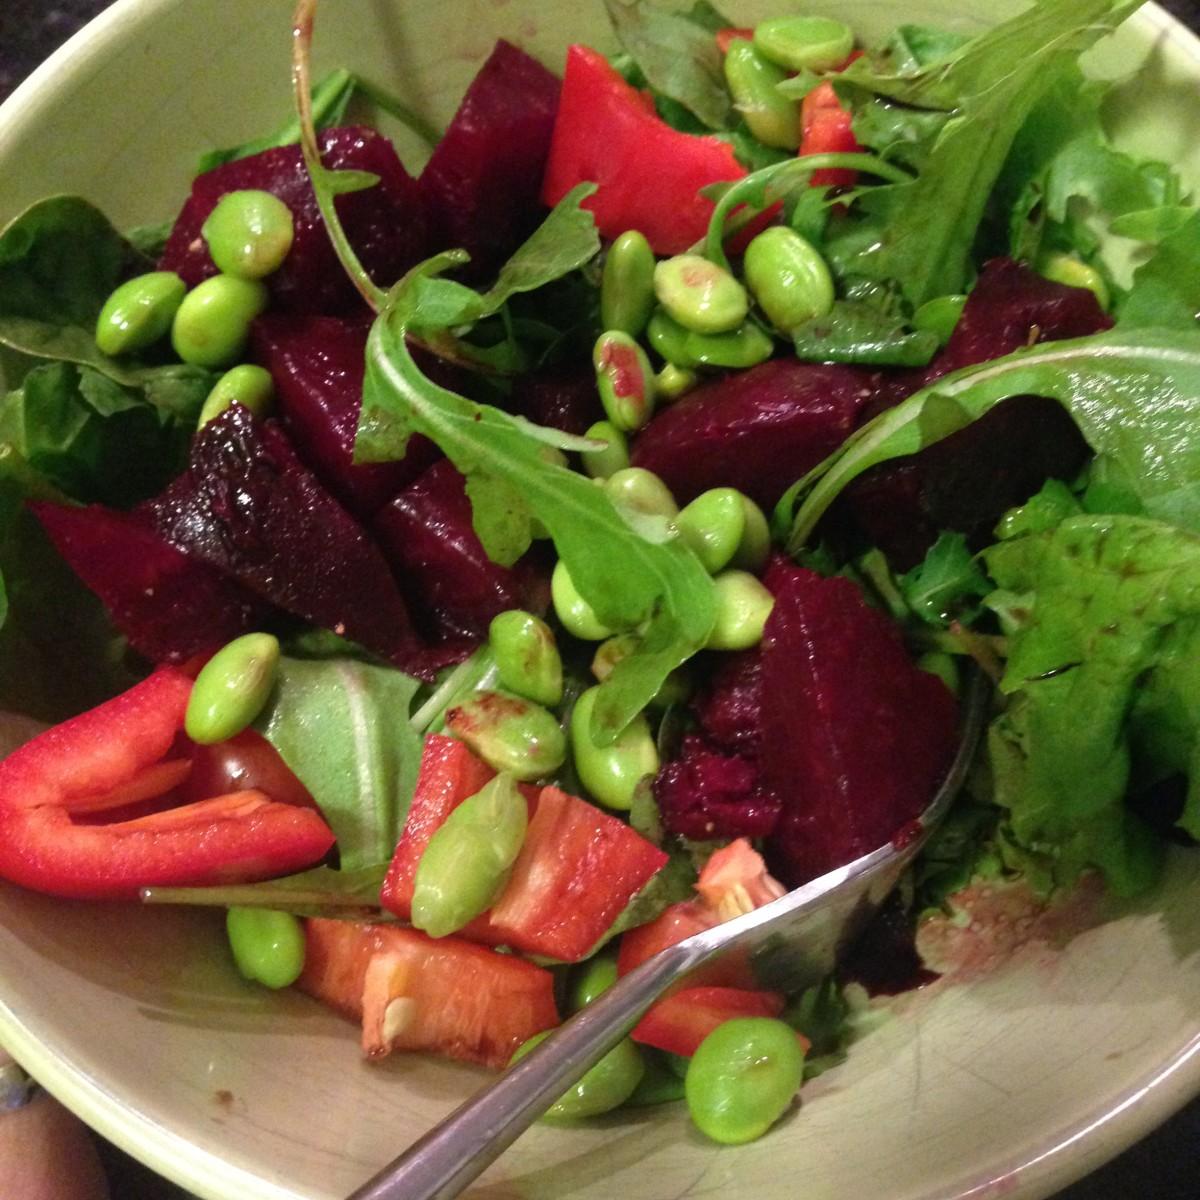 Fall Salad leftovers, colorful fall salad